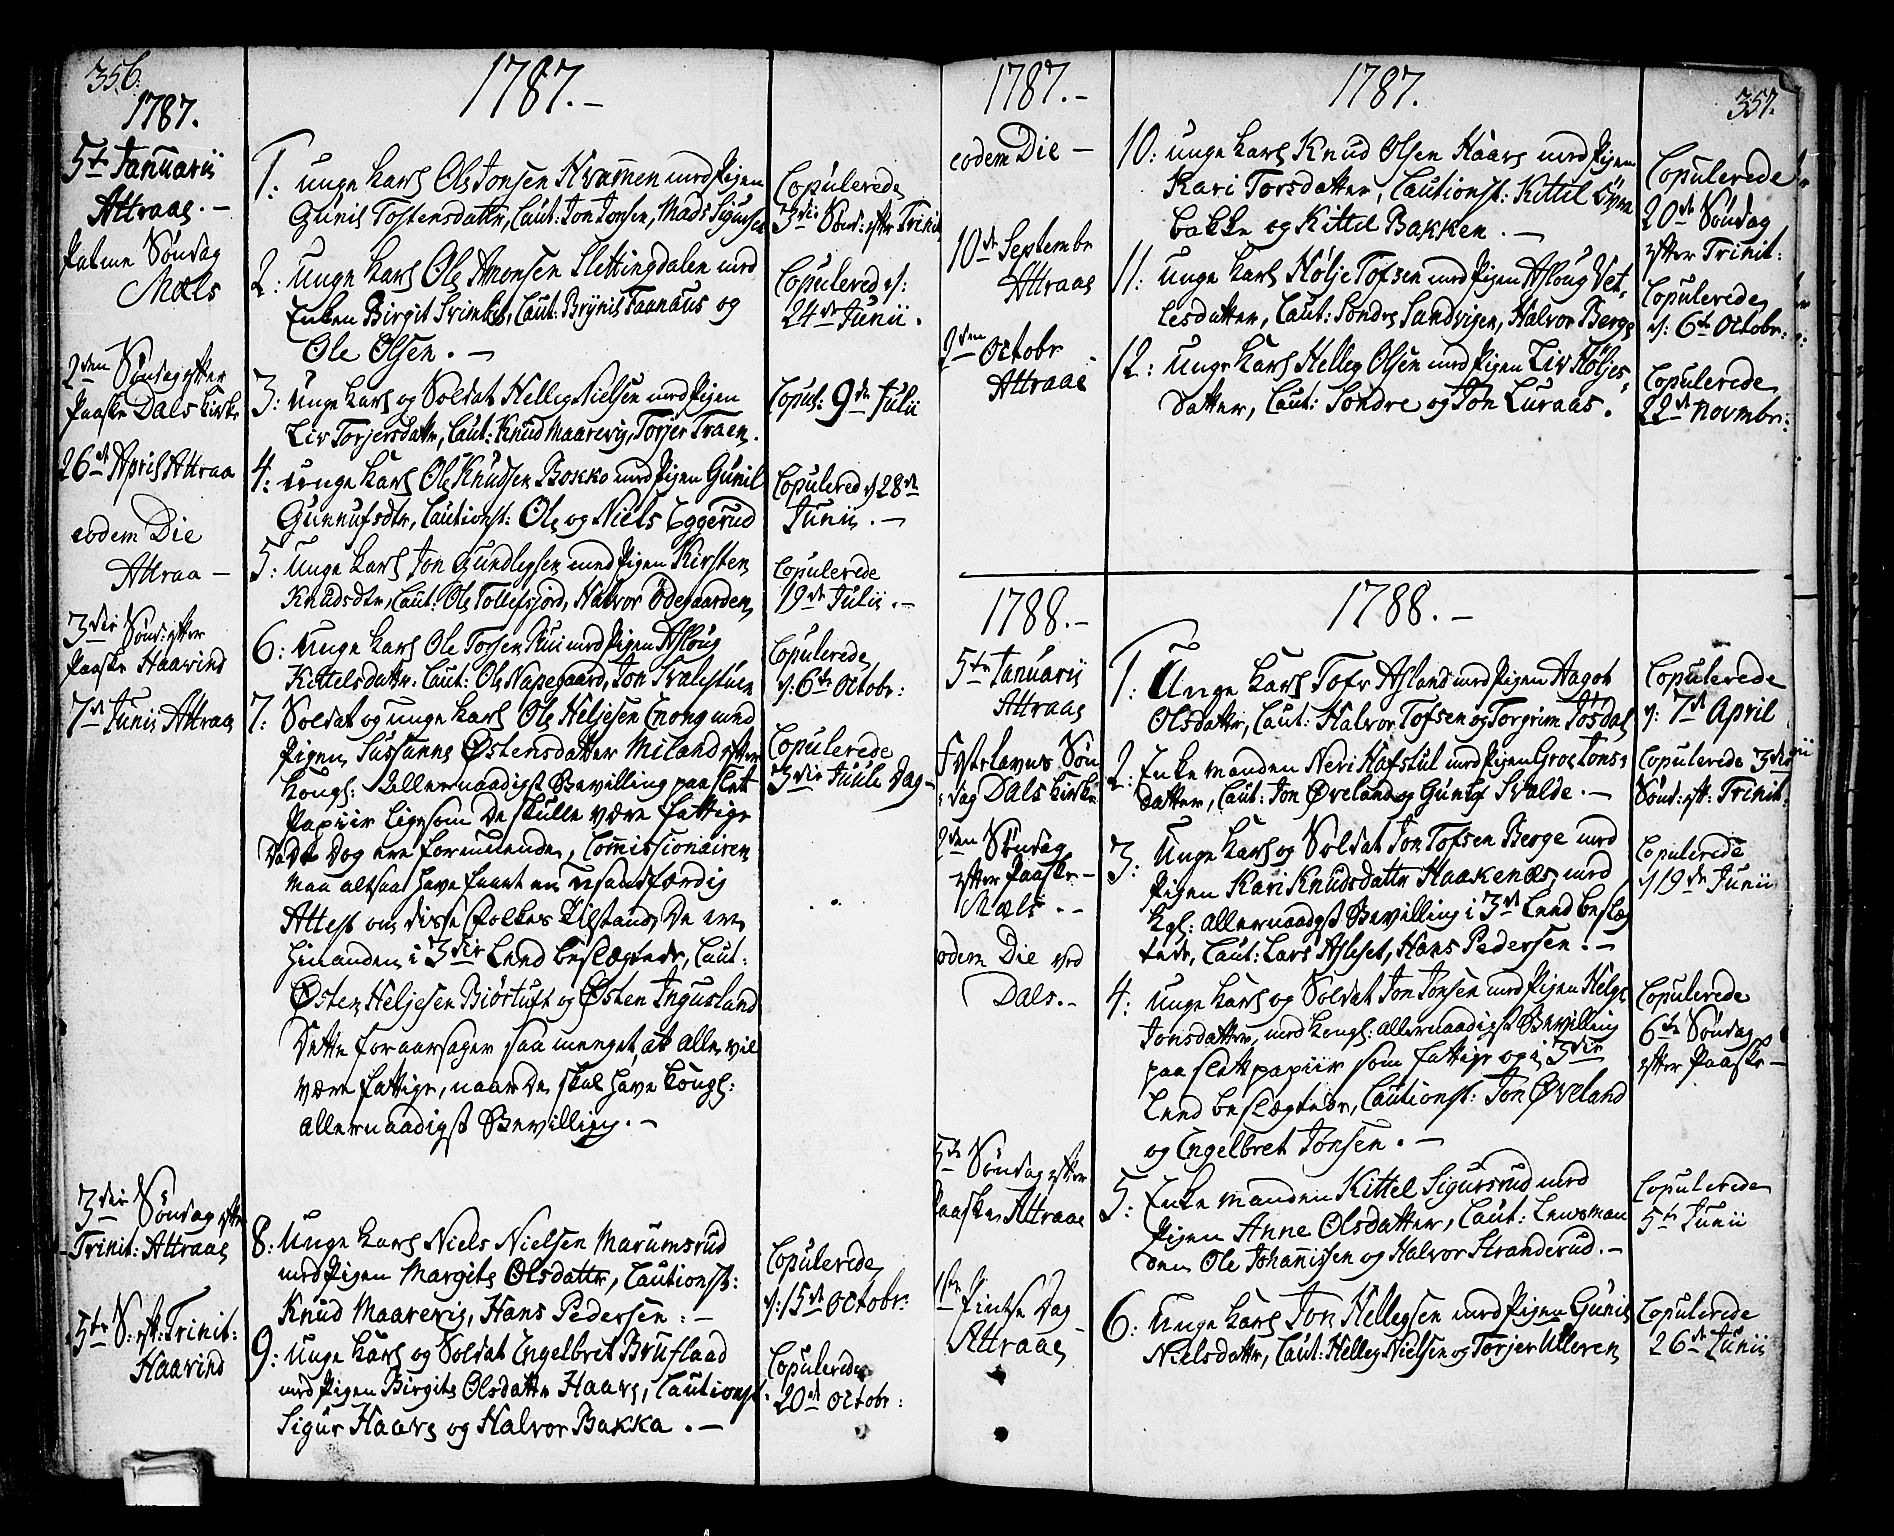 SAKO, Tinn kirkebøker, F/Fa/L0002: Ministerialbok nr. I 2, 1757-1810, s. 356-357